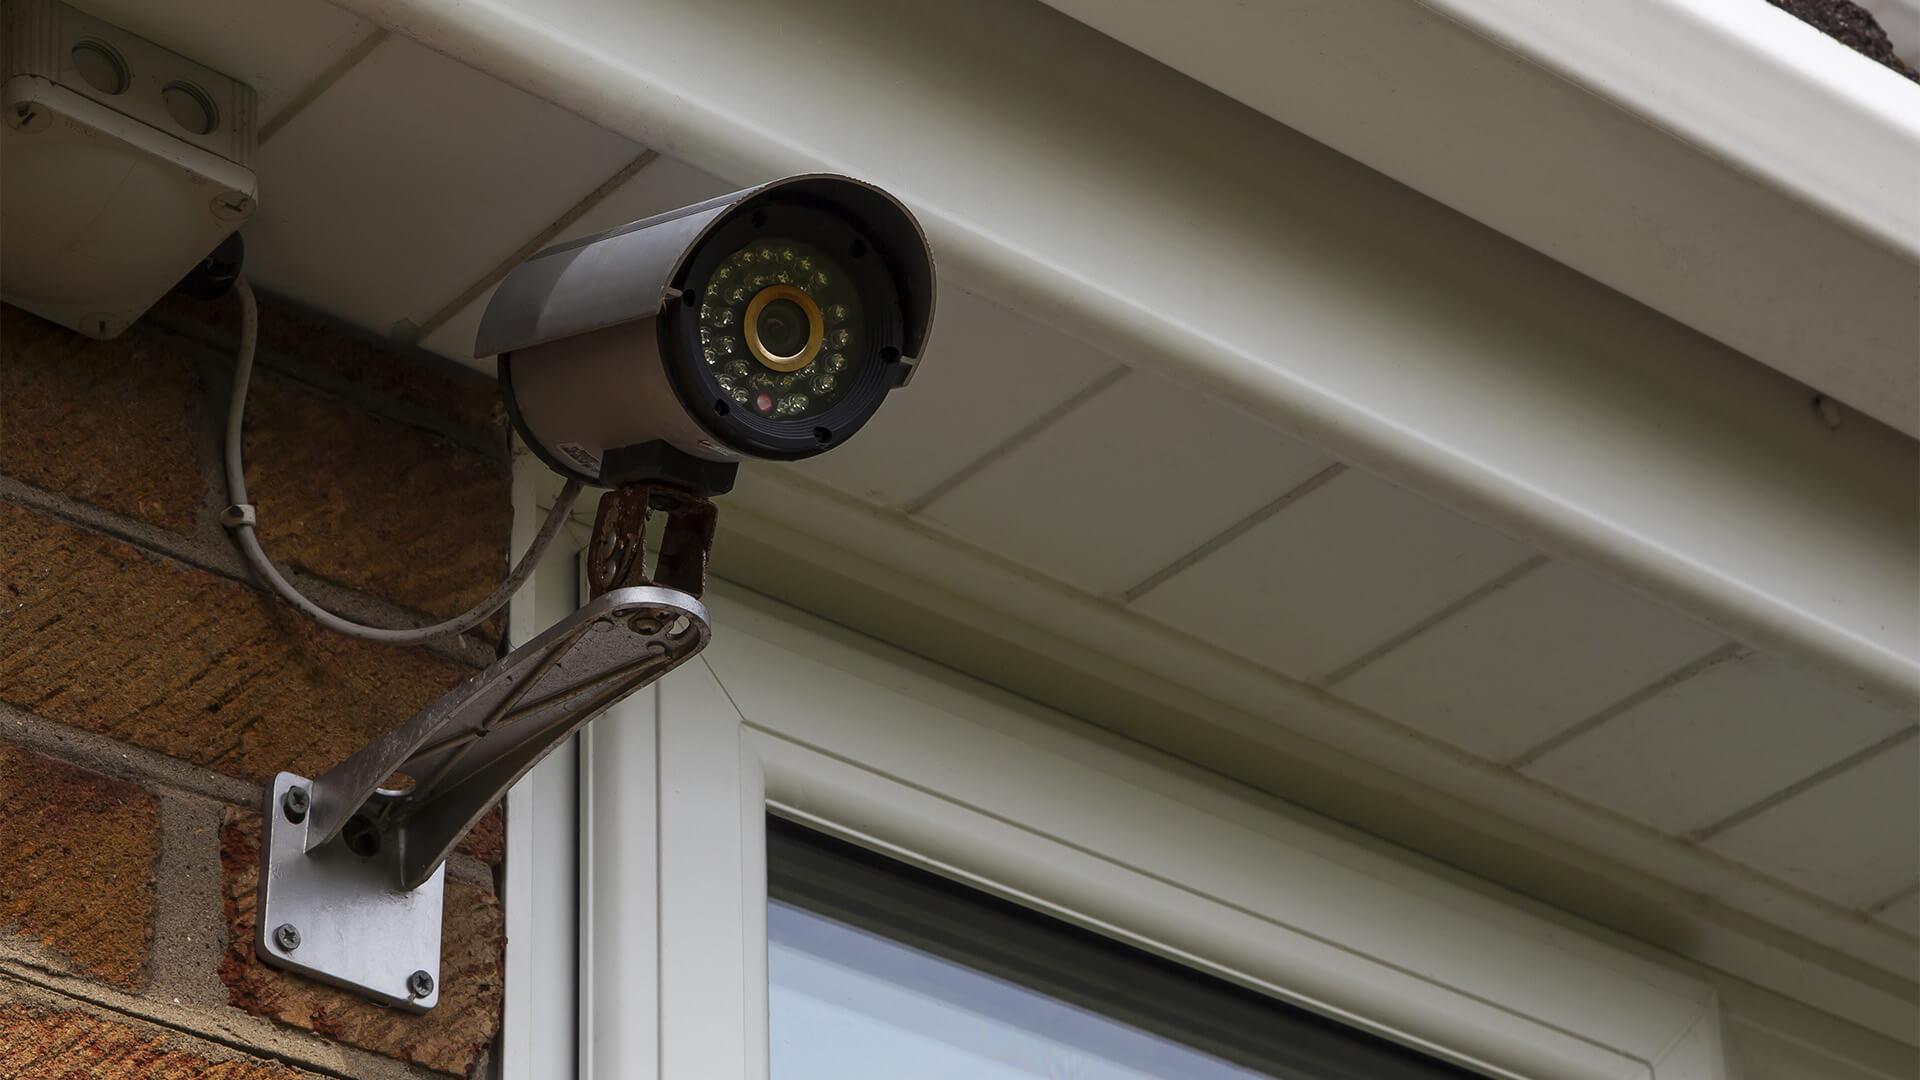 Home video security camera